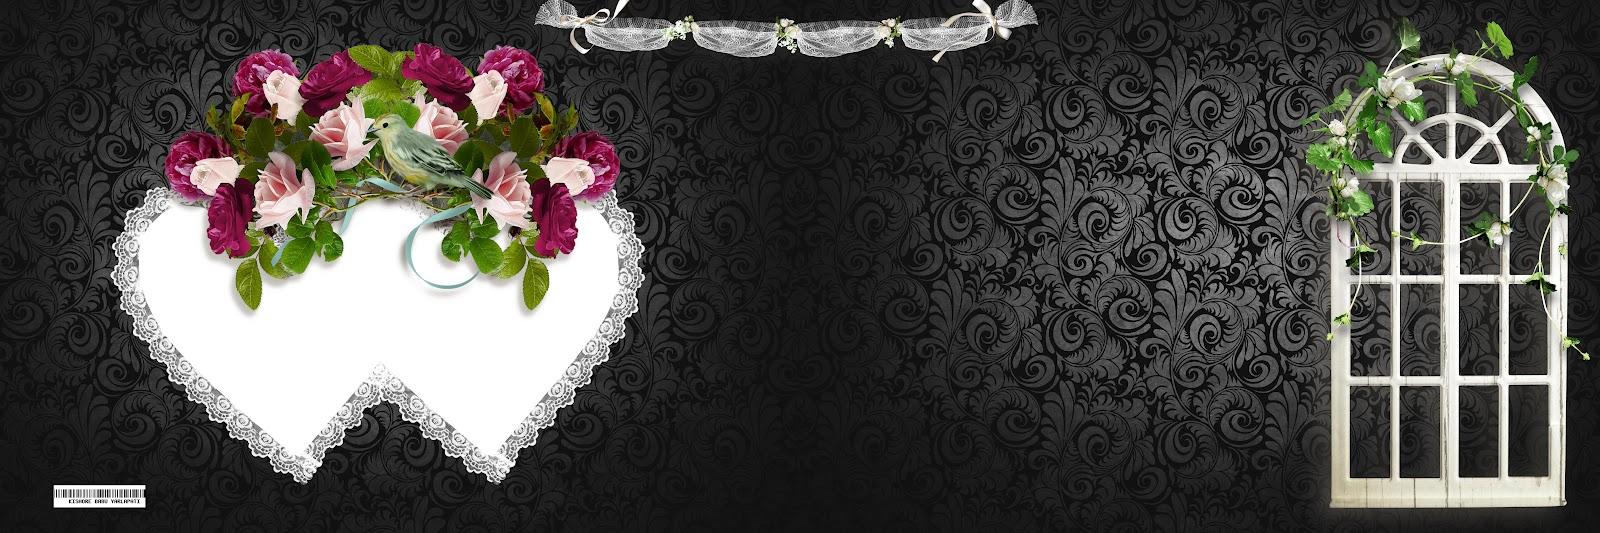 Kerala Wedding Album Design Psd - Unique Wedding Ideas |Wedding Album Cover Design Hd